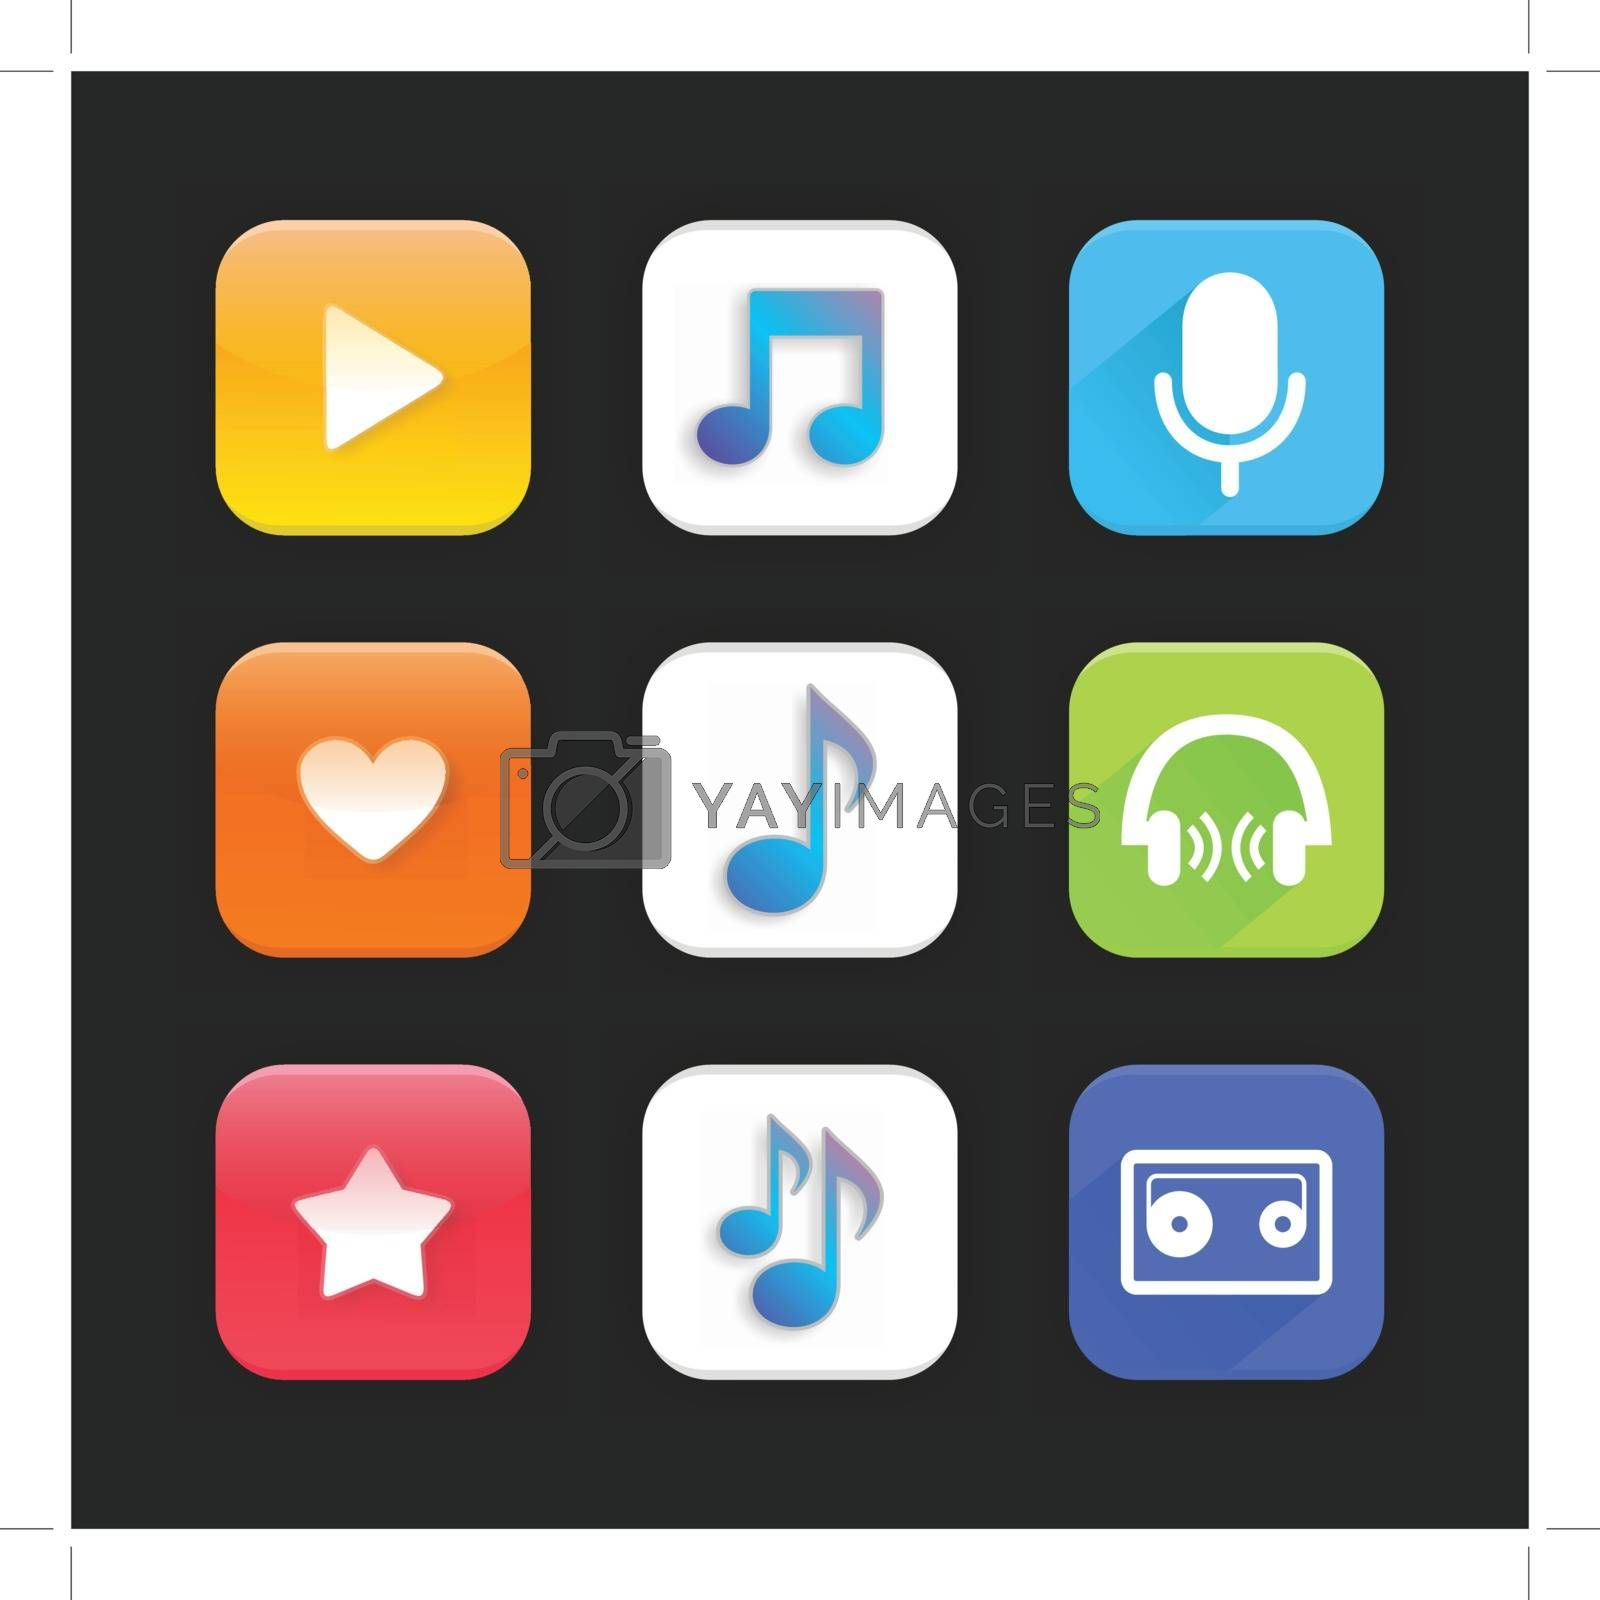 Royalty free image of Music app by aleksander1